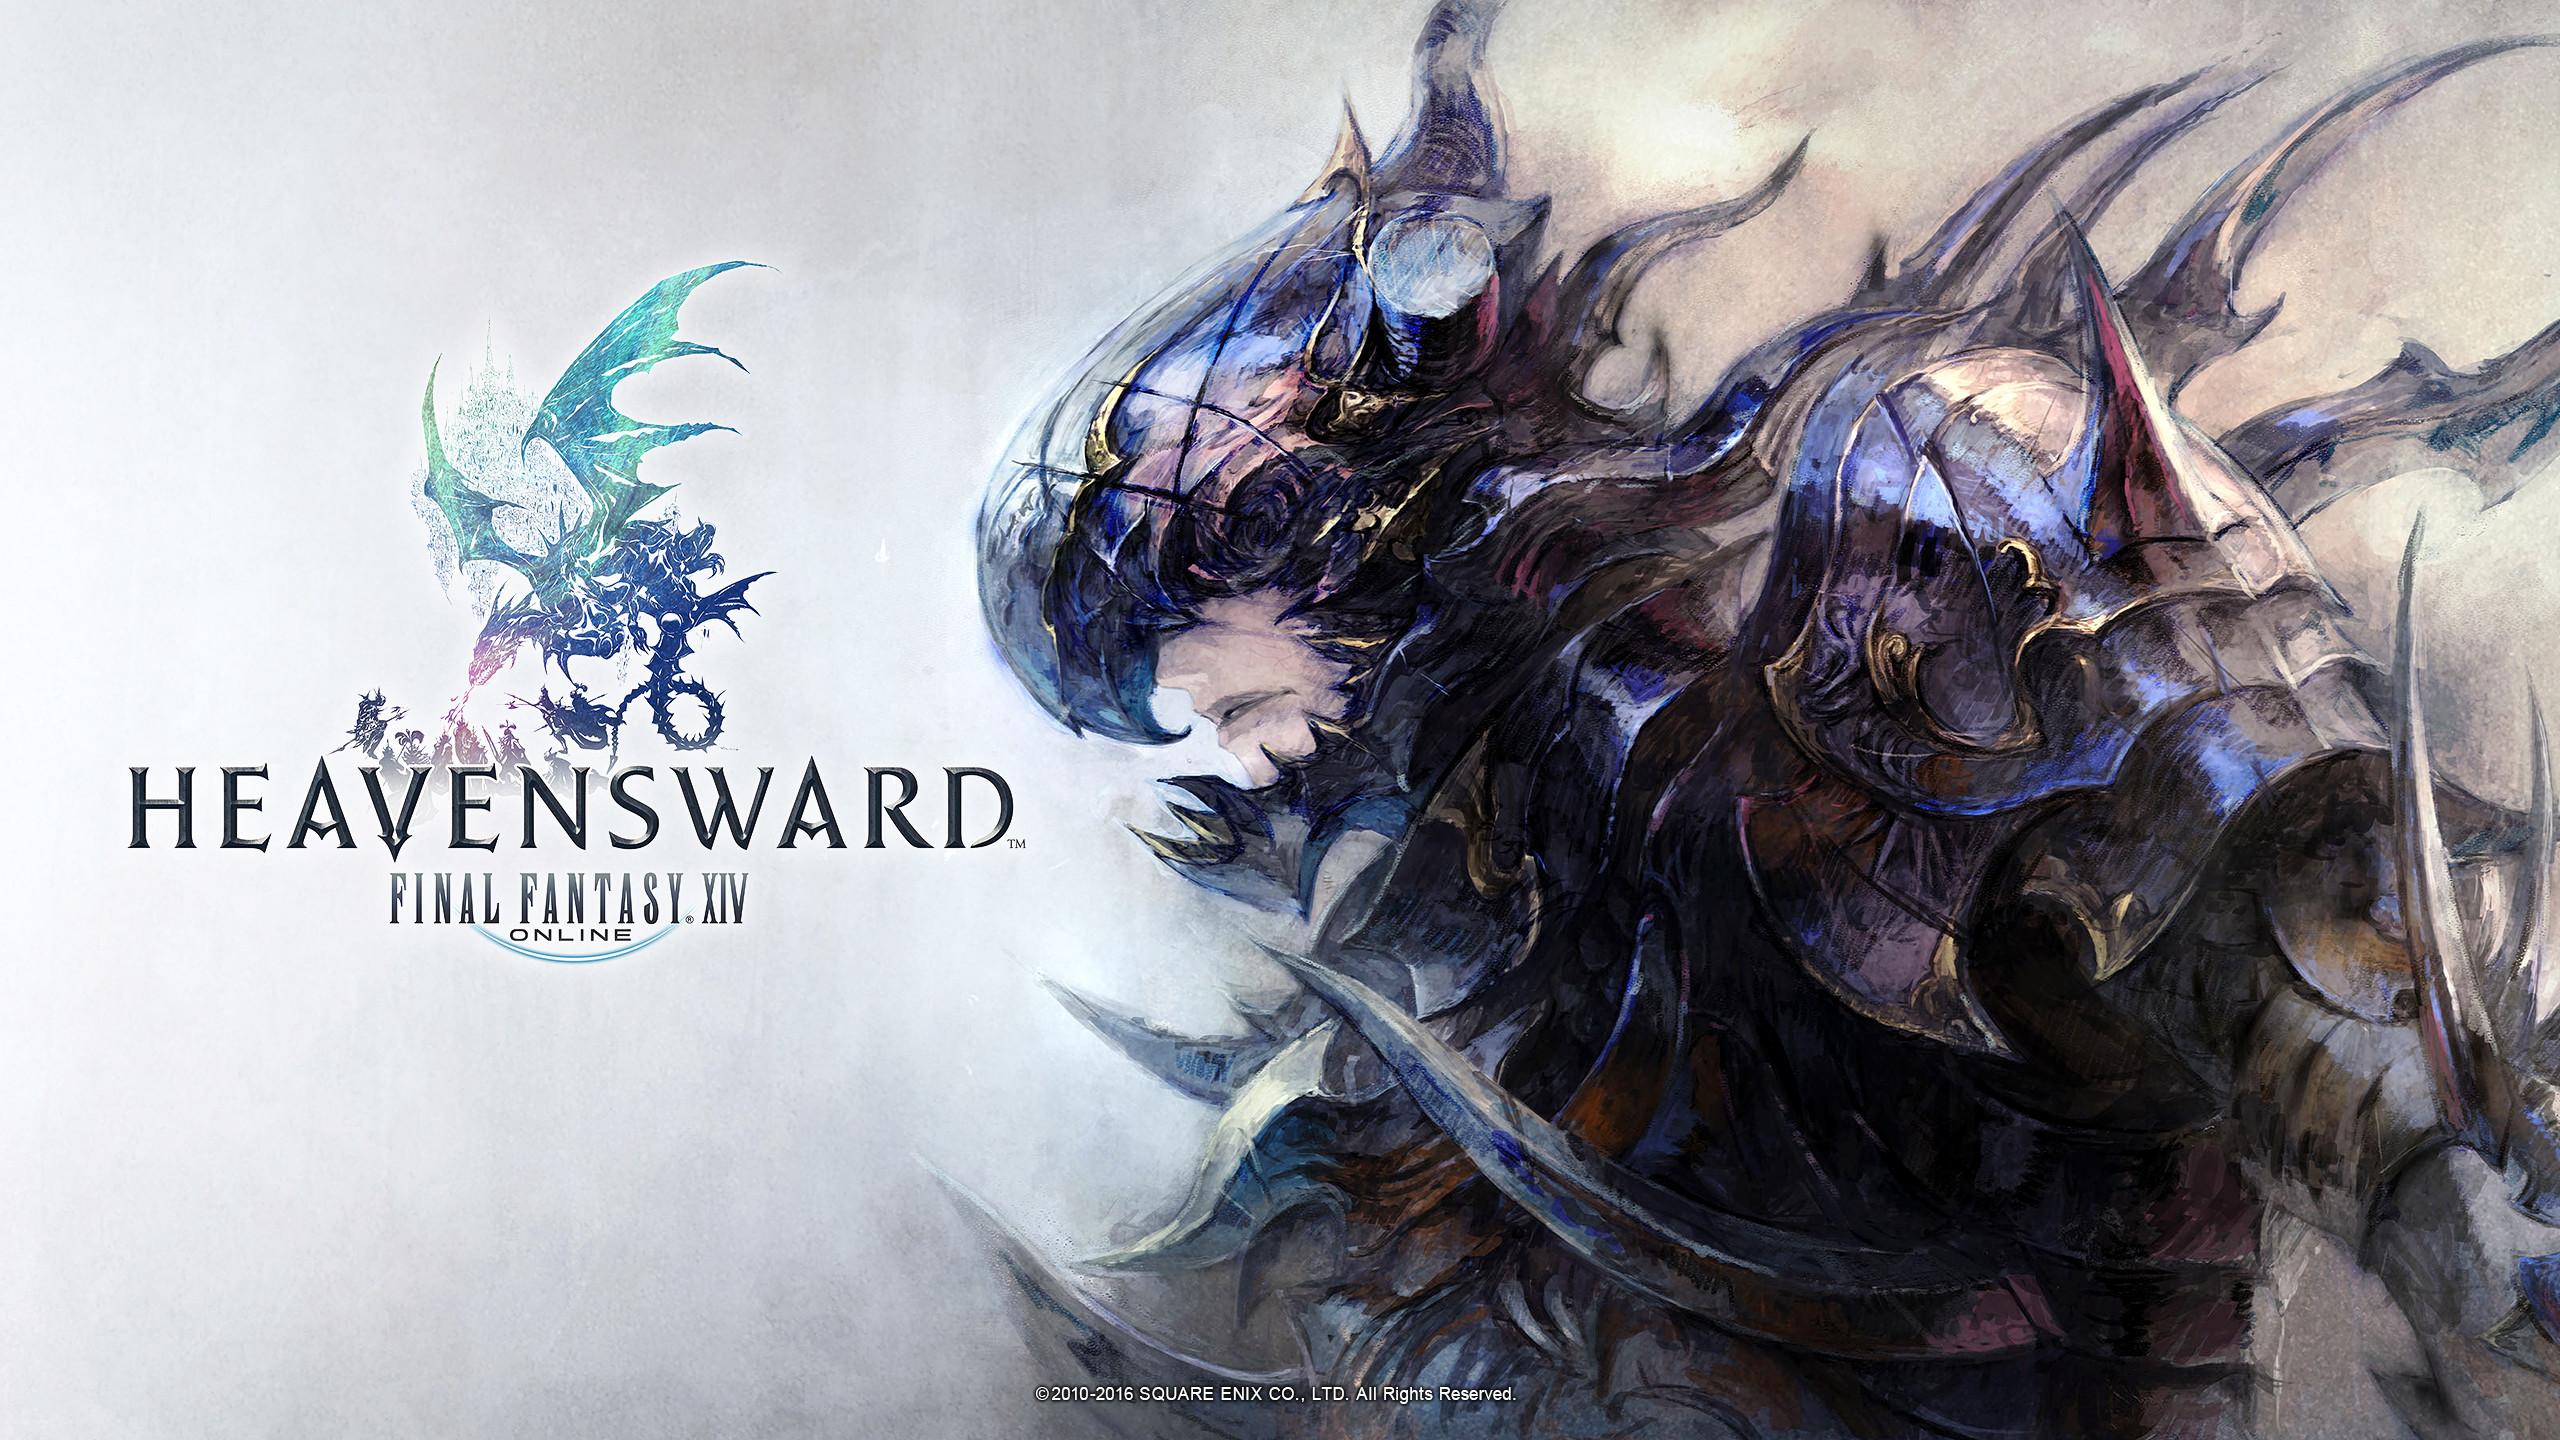 Final Fantasy IX Art HD desktop wallpaper Widescreen High | HD Wallpapers |  Pinterest | Final fantasy, Wallpaper and Wallpaper backgrounds